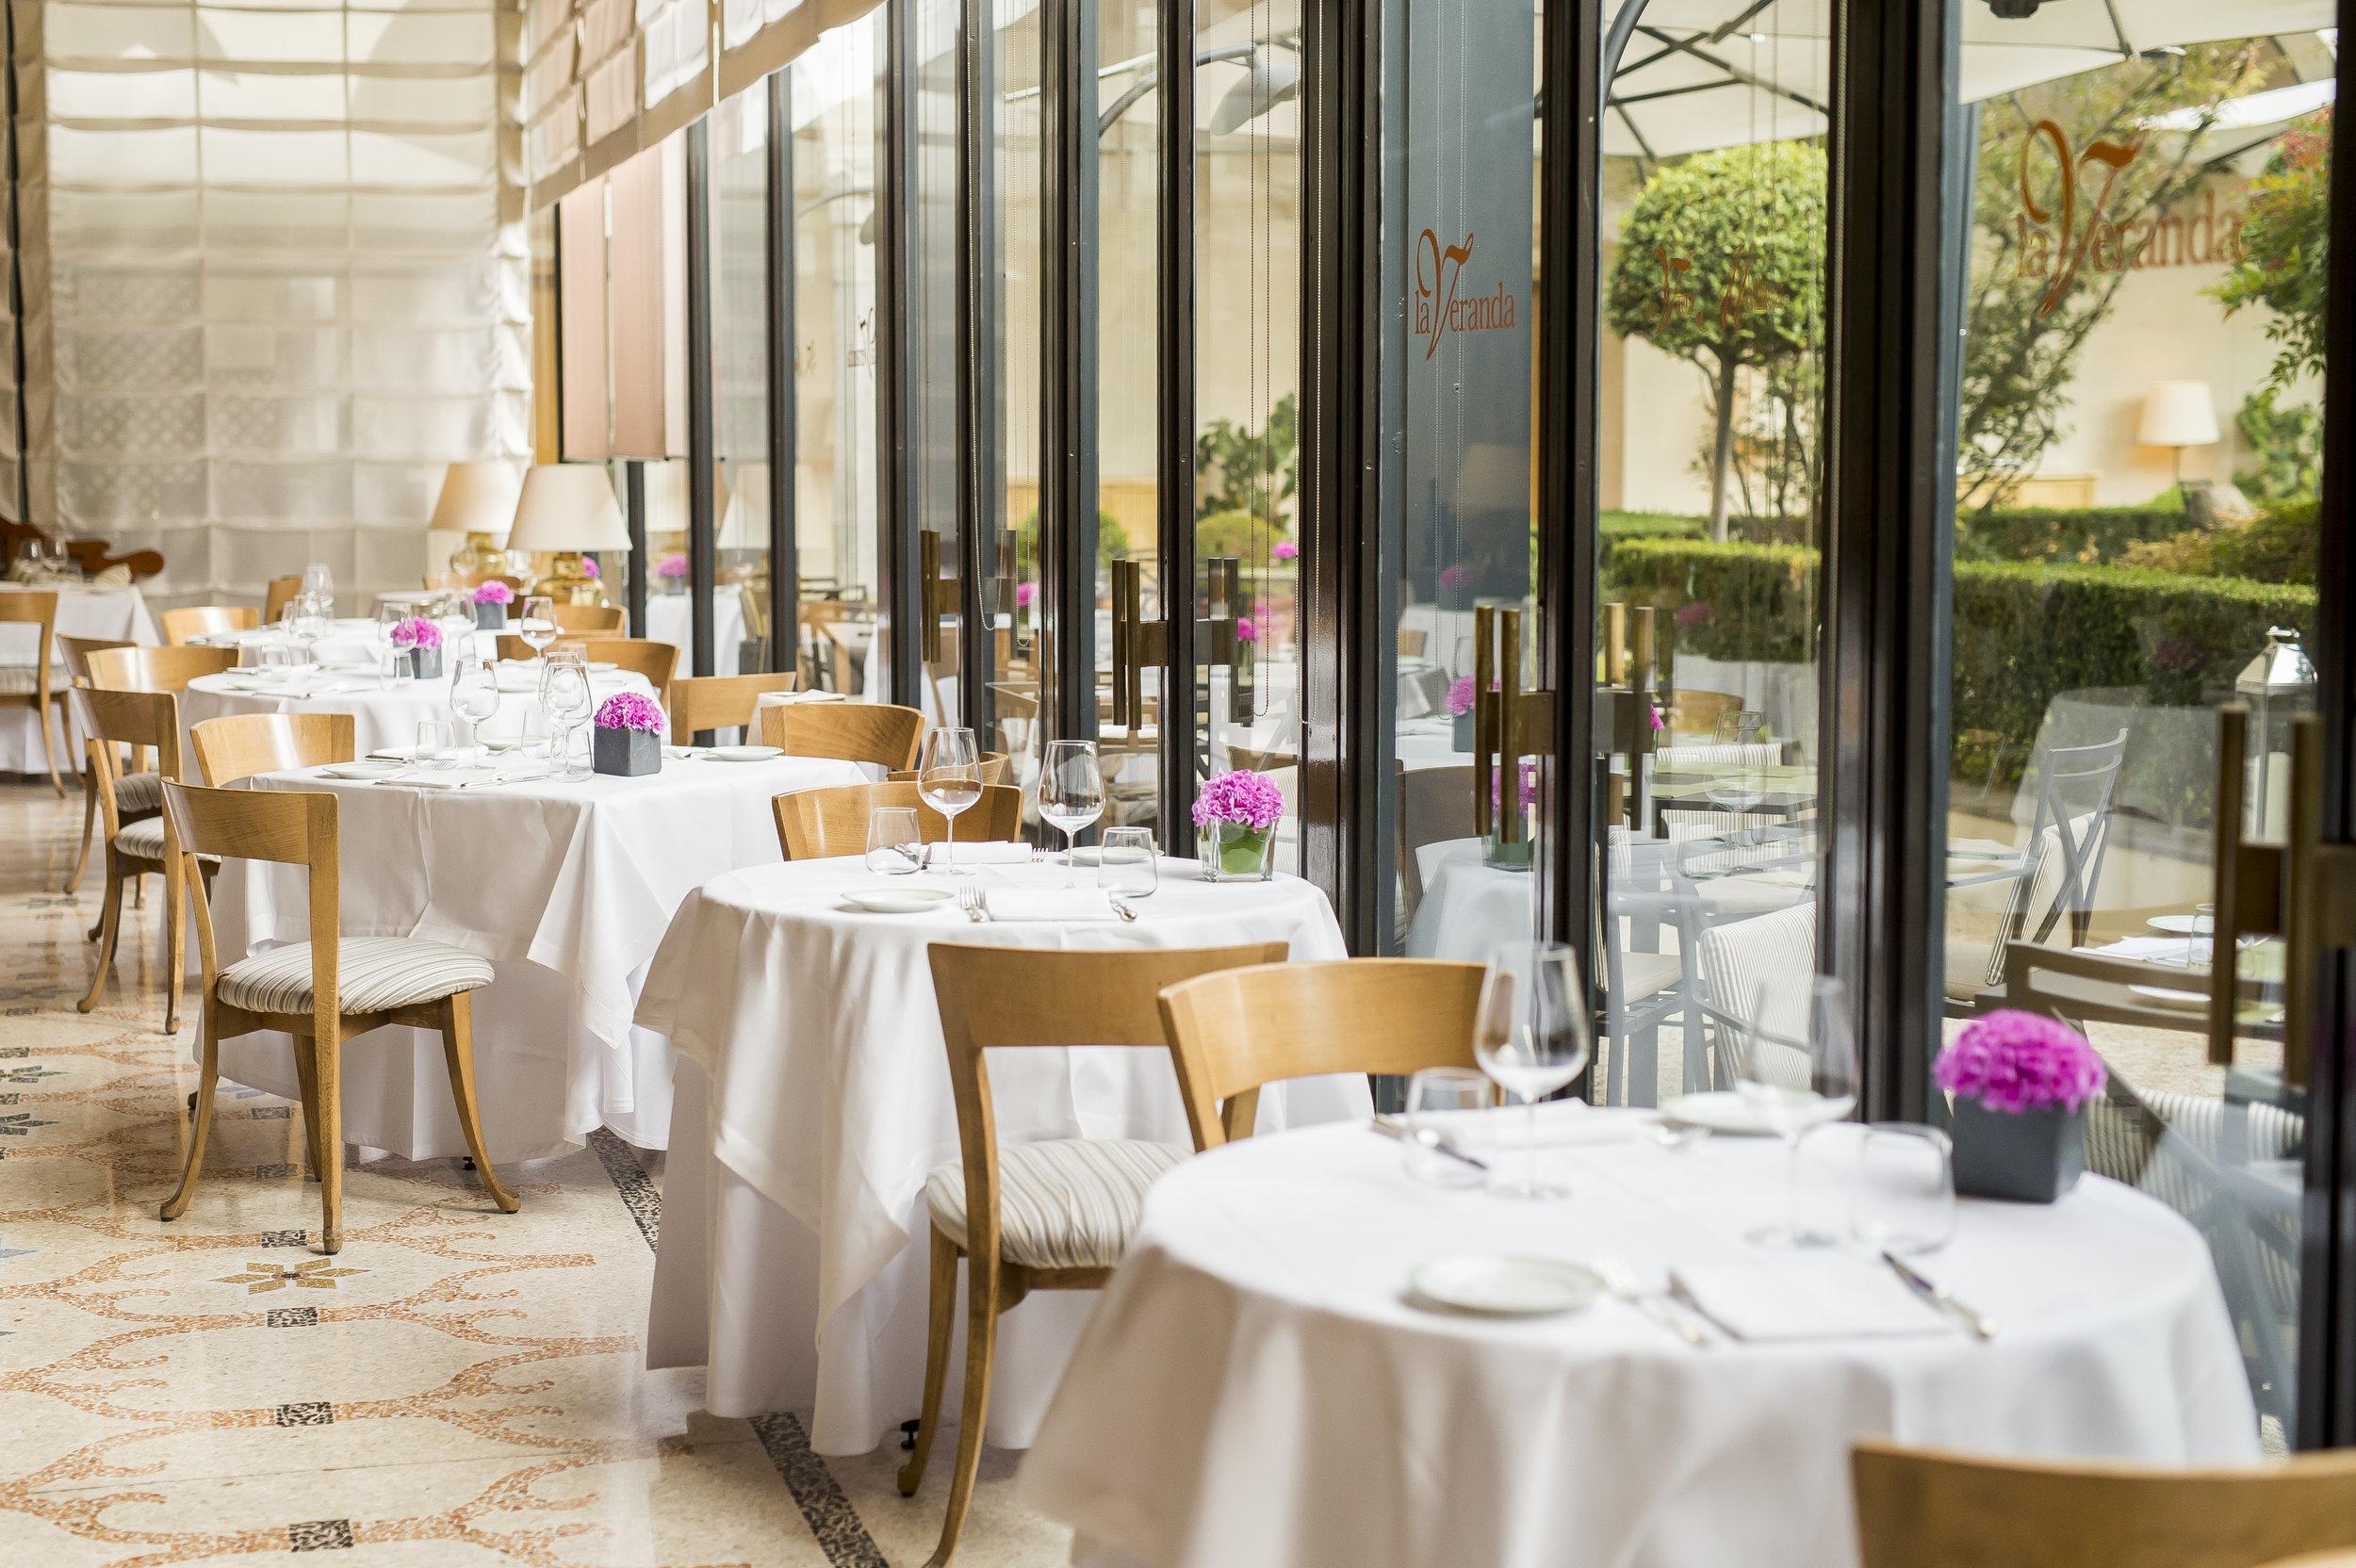 La Veranda Restaurant,  Four Seasons Hotel Milano.jpg